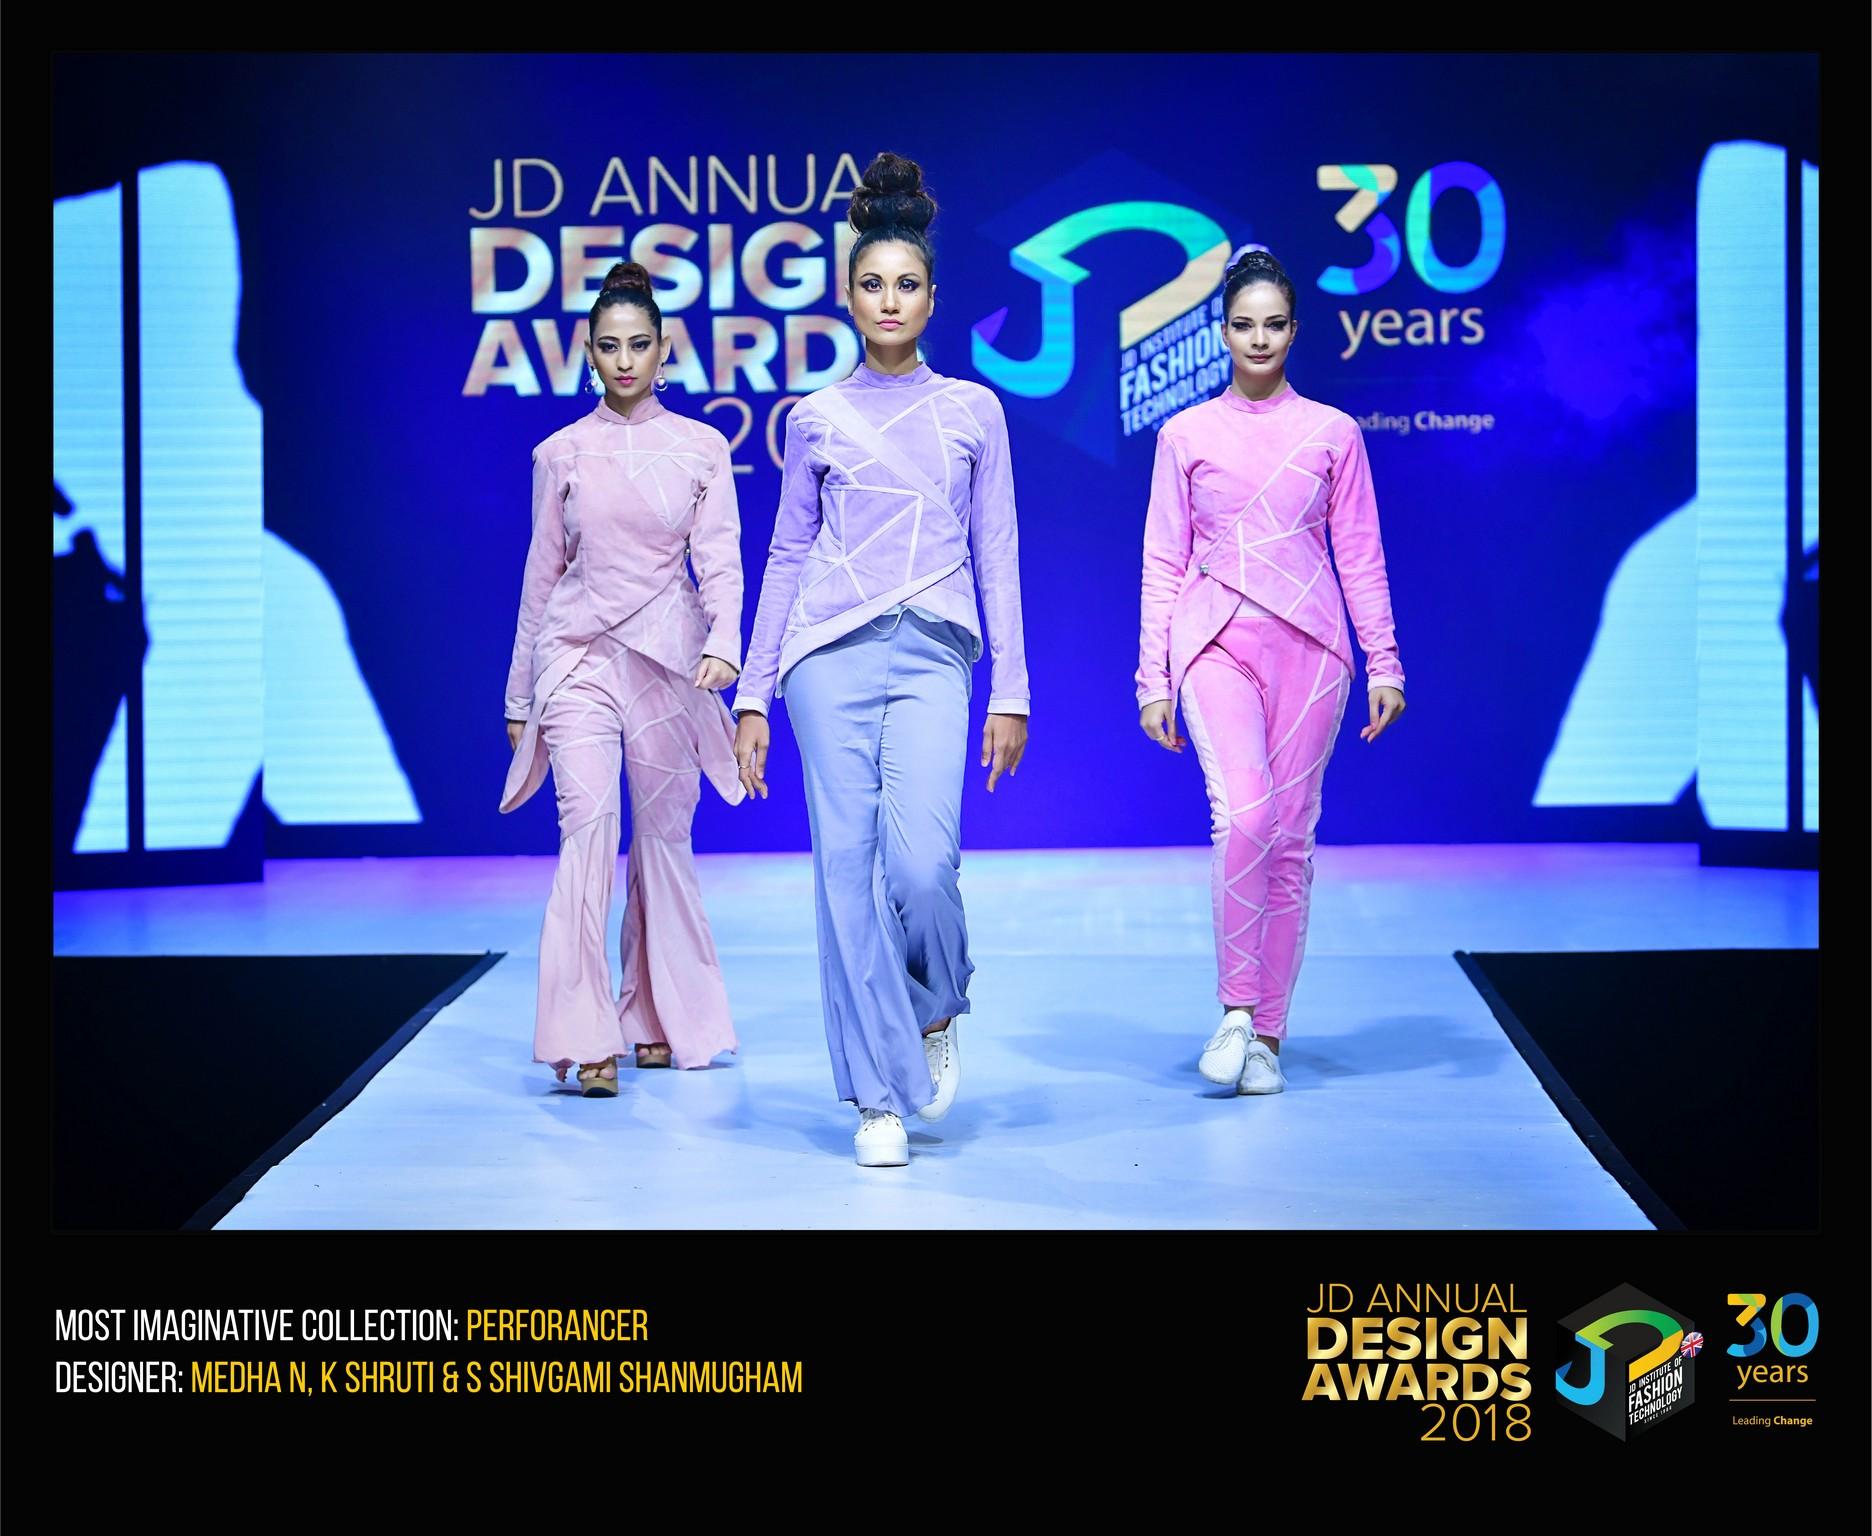 Perforancer – Change – JD Annual Design Awards 2018 | Designer: Sohinee, Ravina and Varsha | Photography : Jerin Nath (@jerin_nath) perforancer - PERFORANCER8 - Perforancer – Change – JD Annual Design Awards 2018